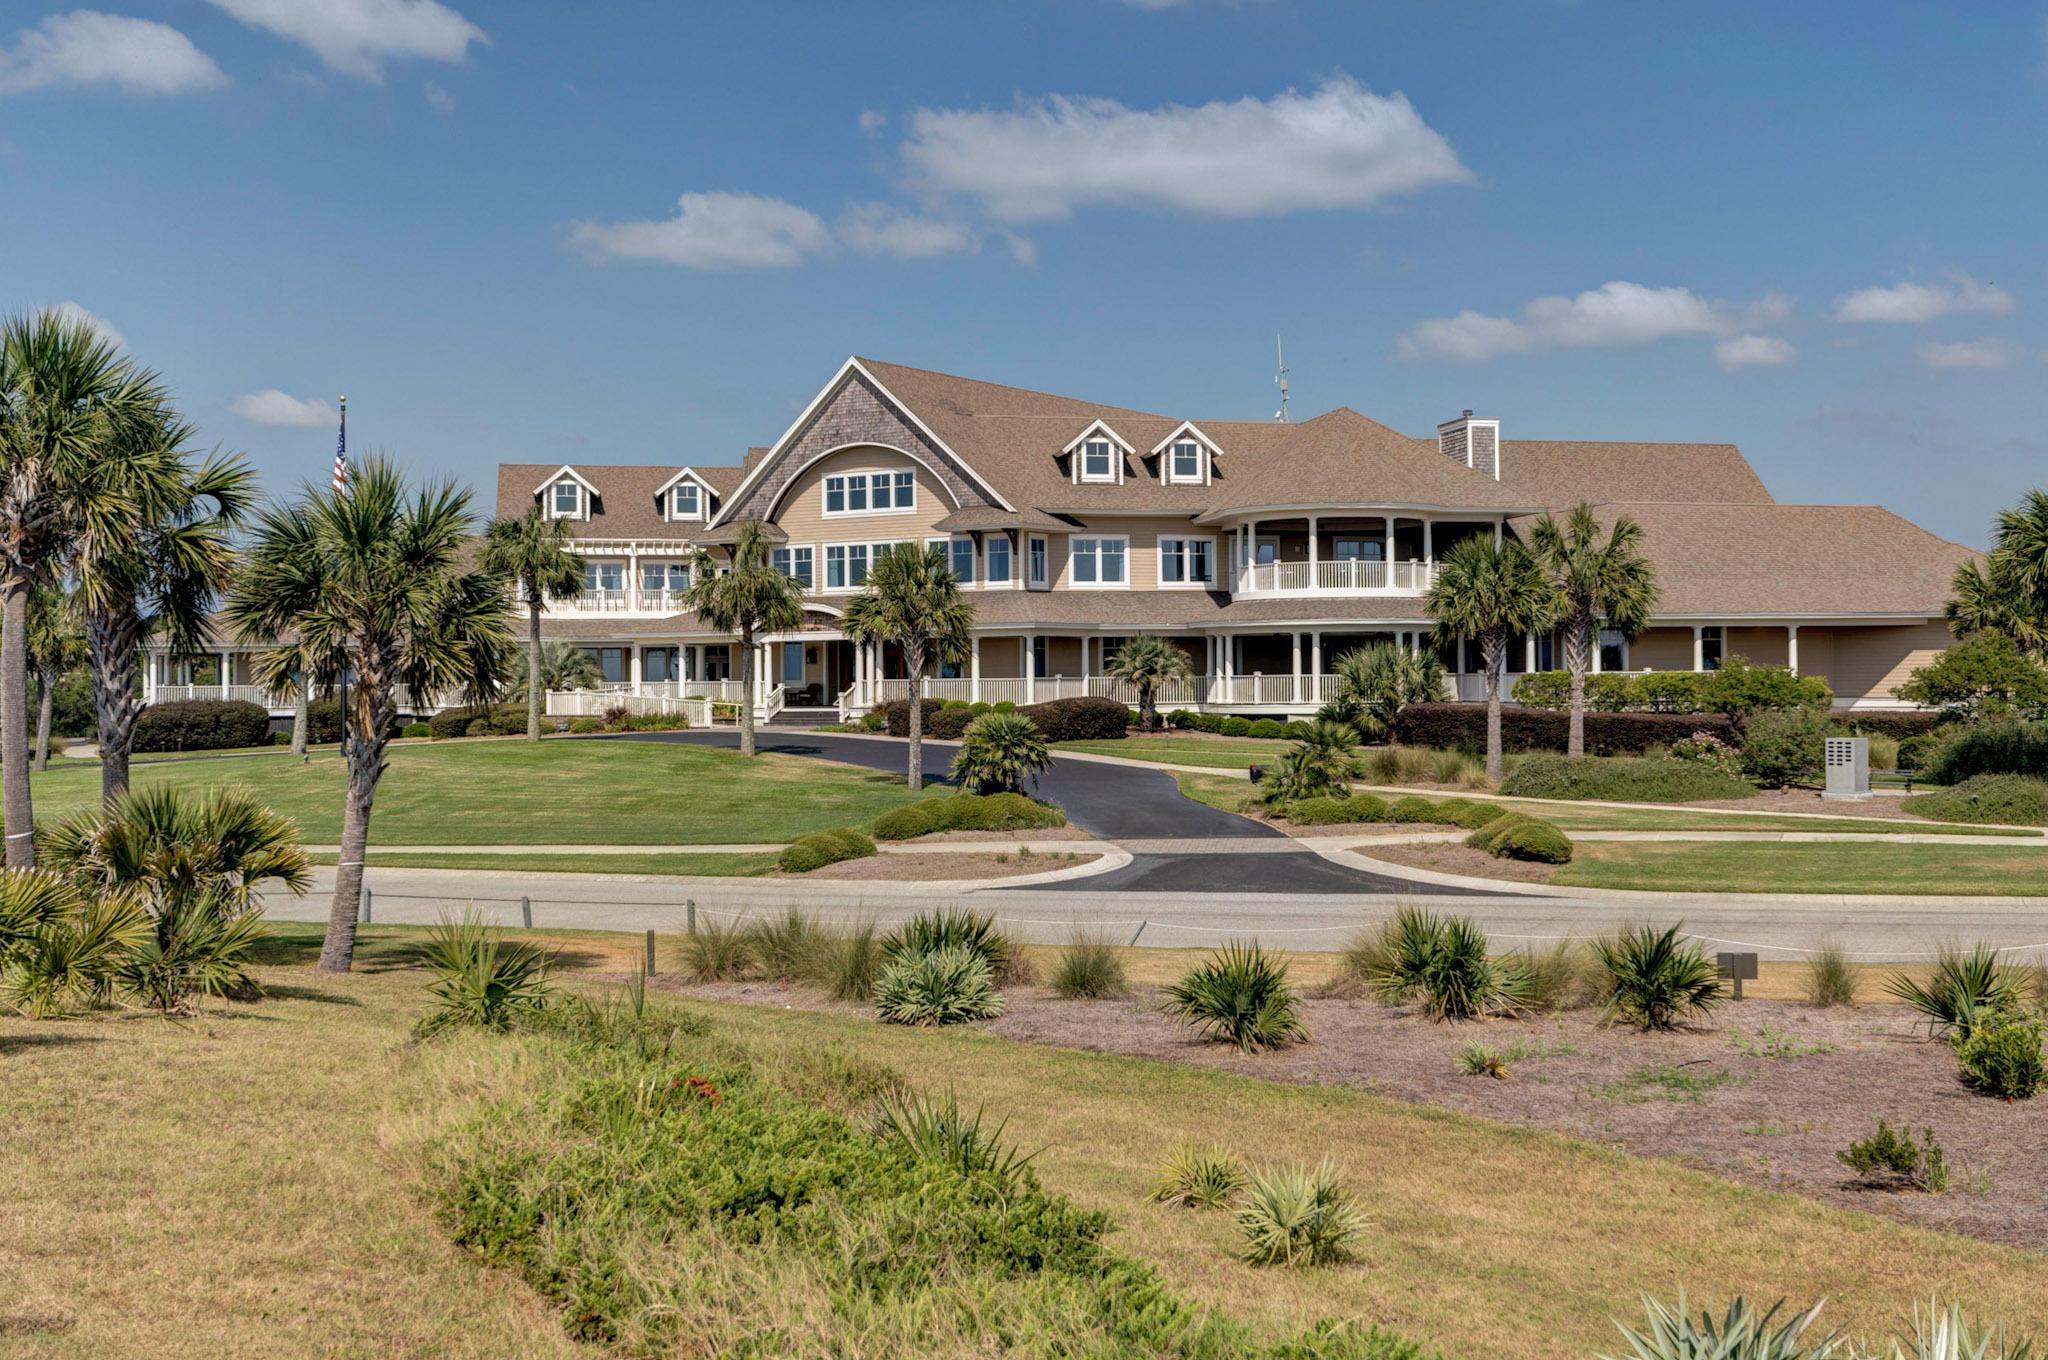 Creek Watch Villas Homes For Sale - 1244 Creek Watch, Johns Island, SC - 30